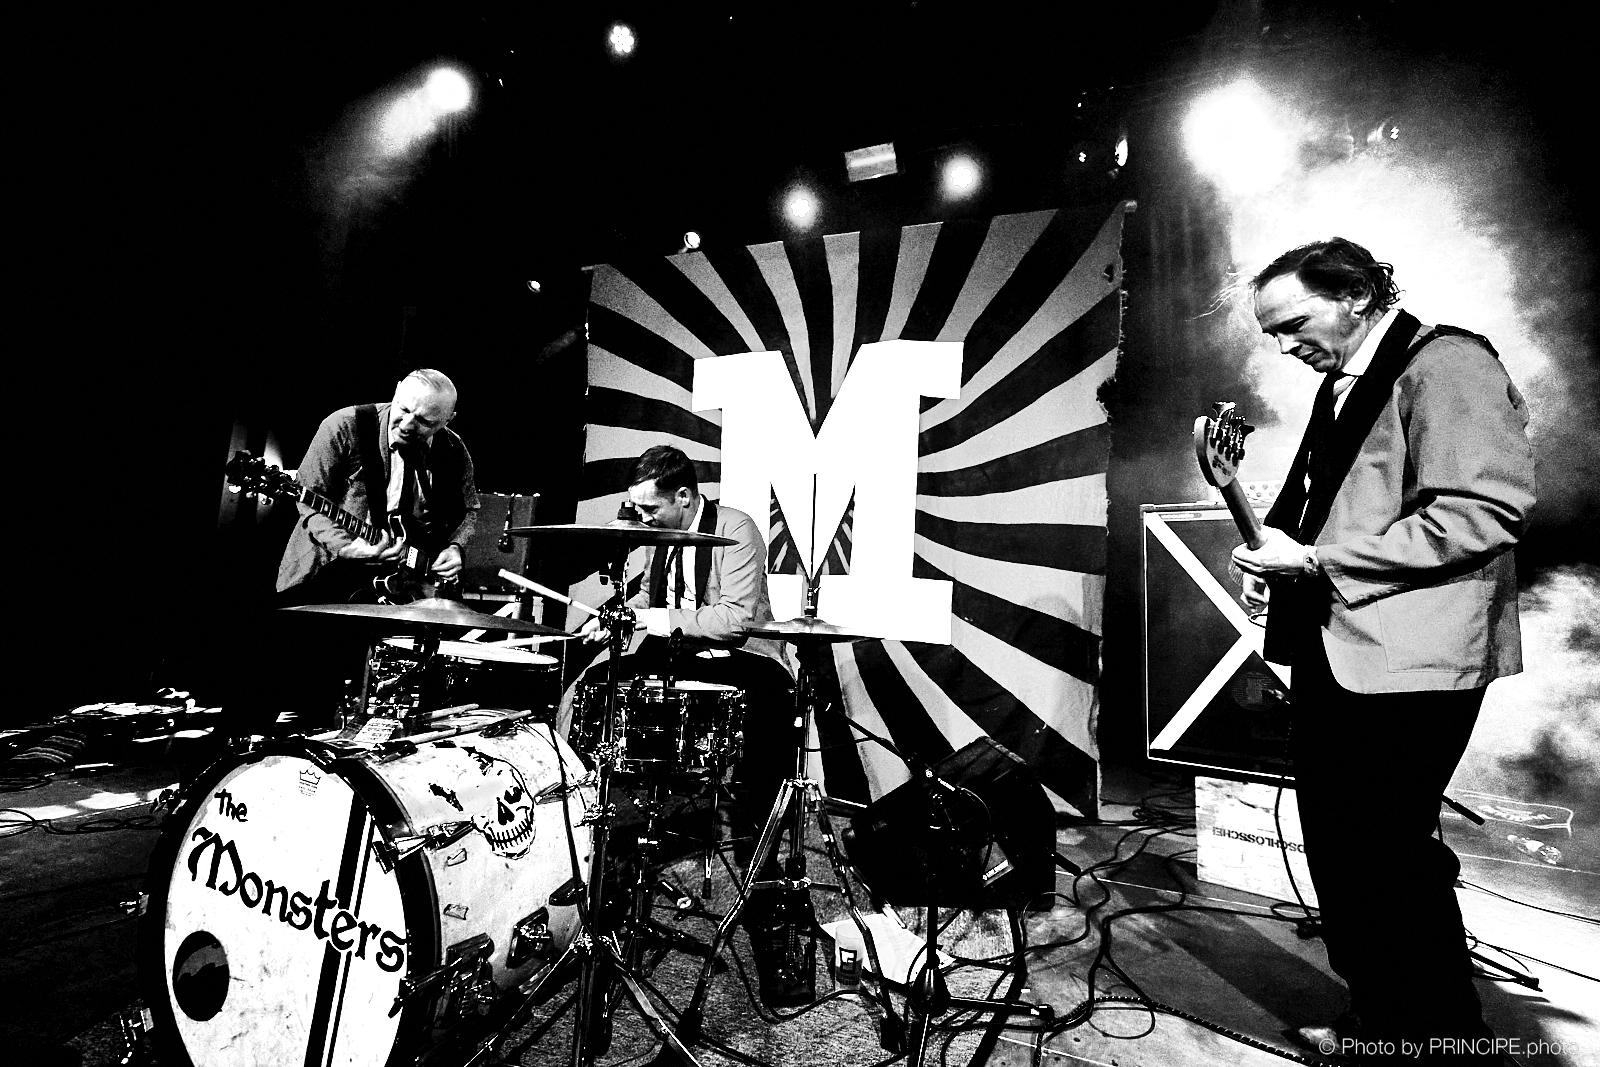 The Monsters @ Voodoo Rhythm Label Night